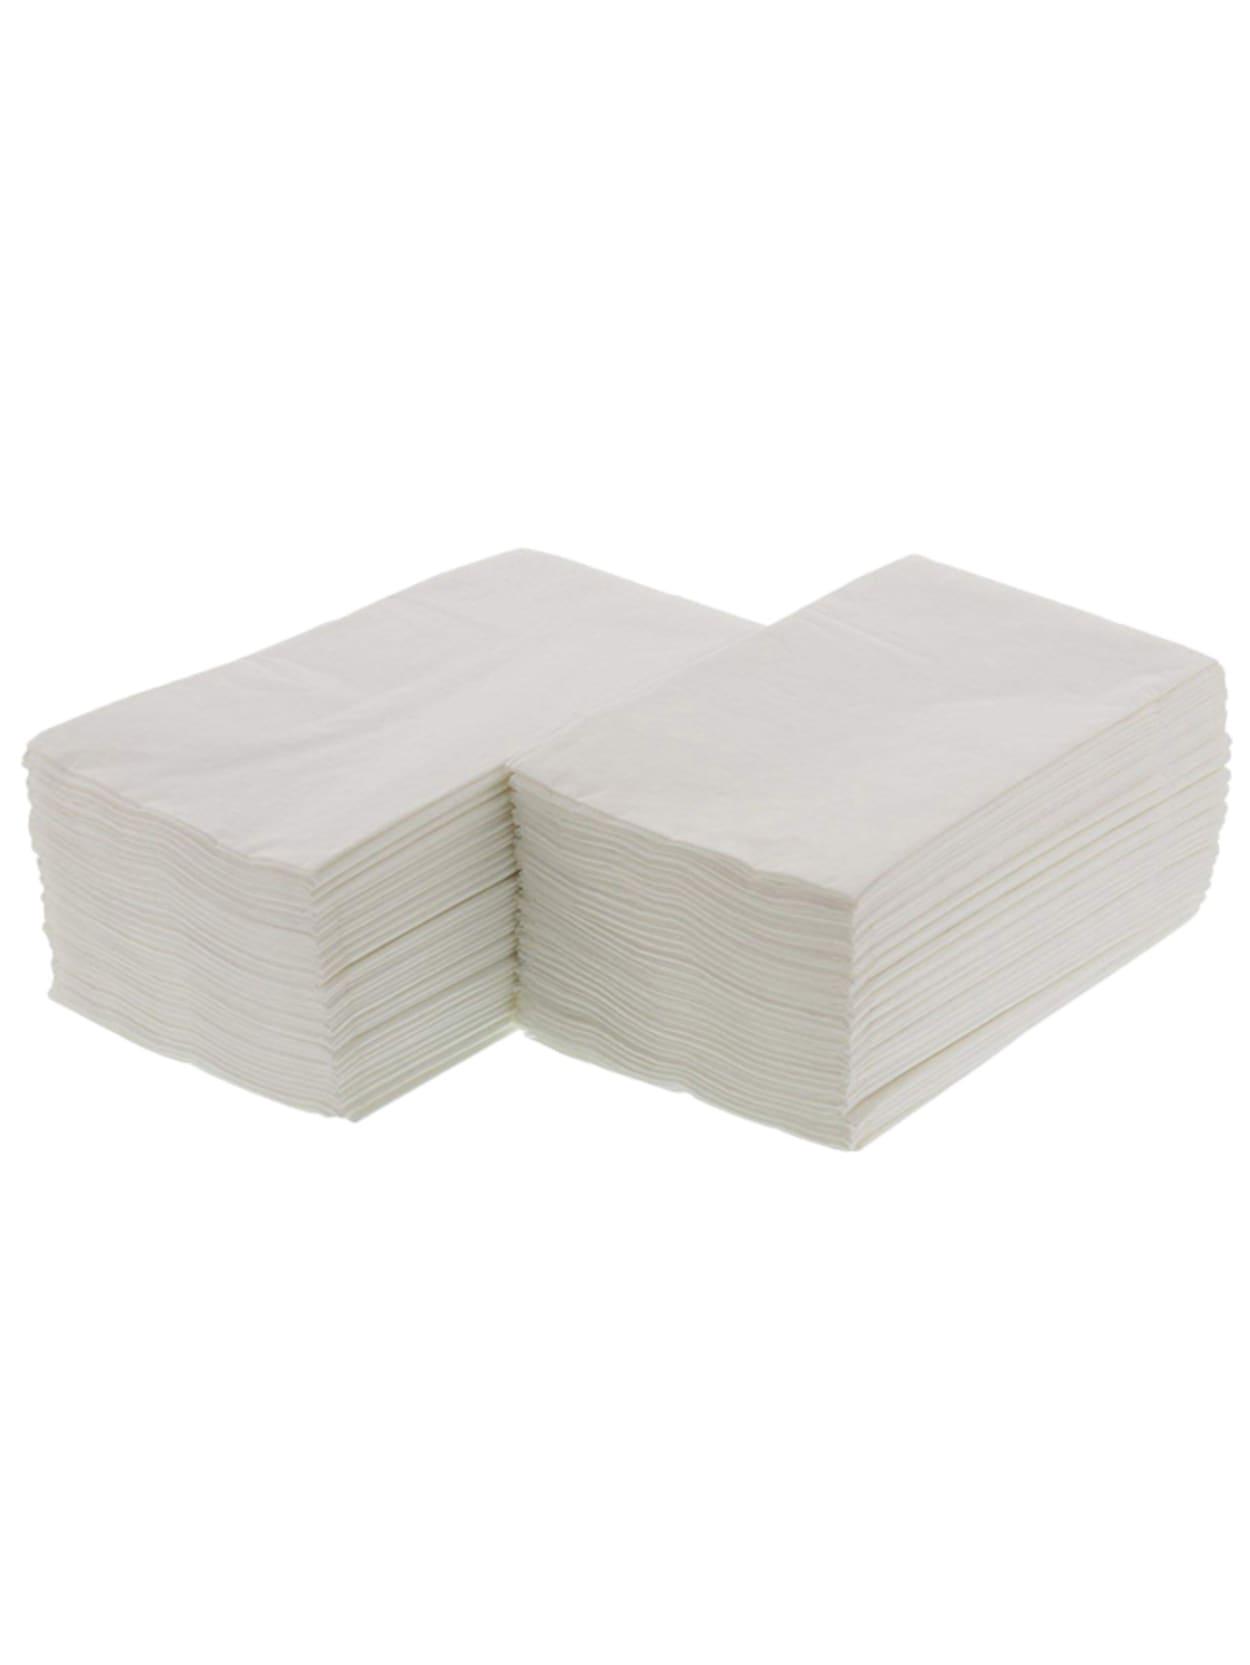 Hi Valu 2 Ply Dinner Napkins 18 Fold 15 X 17 White Pack Of 3000 Napkins Office Depot